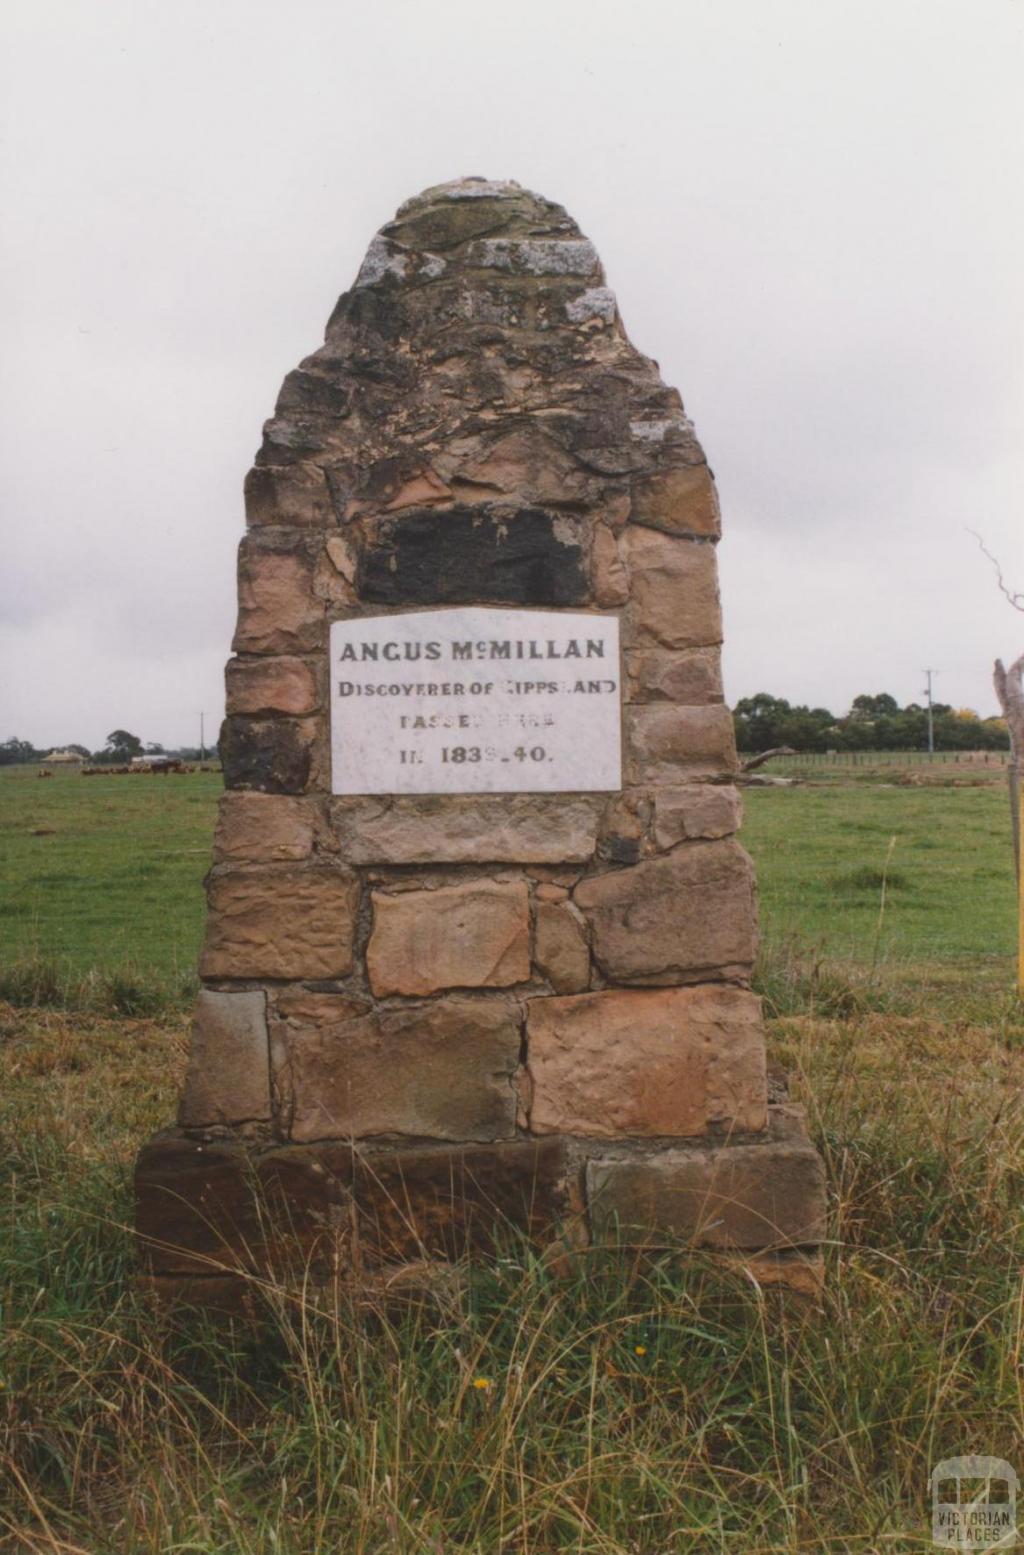 Memorial to Angus McMillan opposite Bundalaguah school